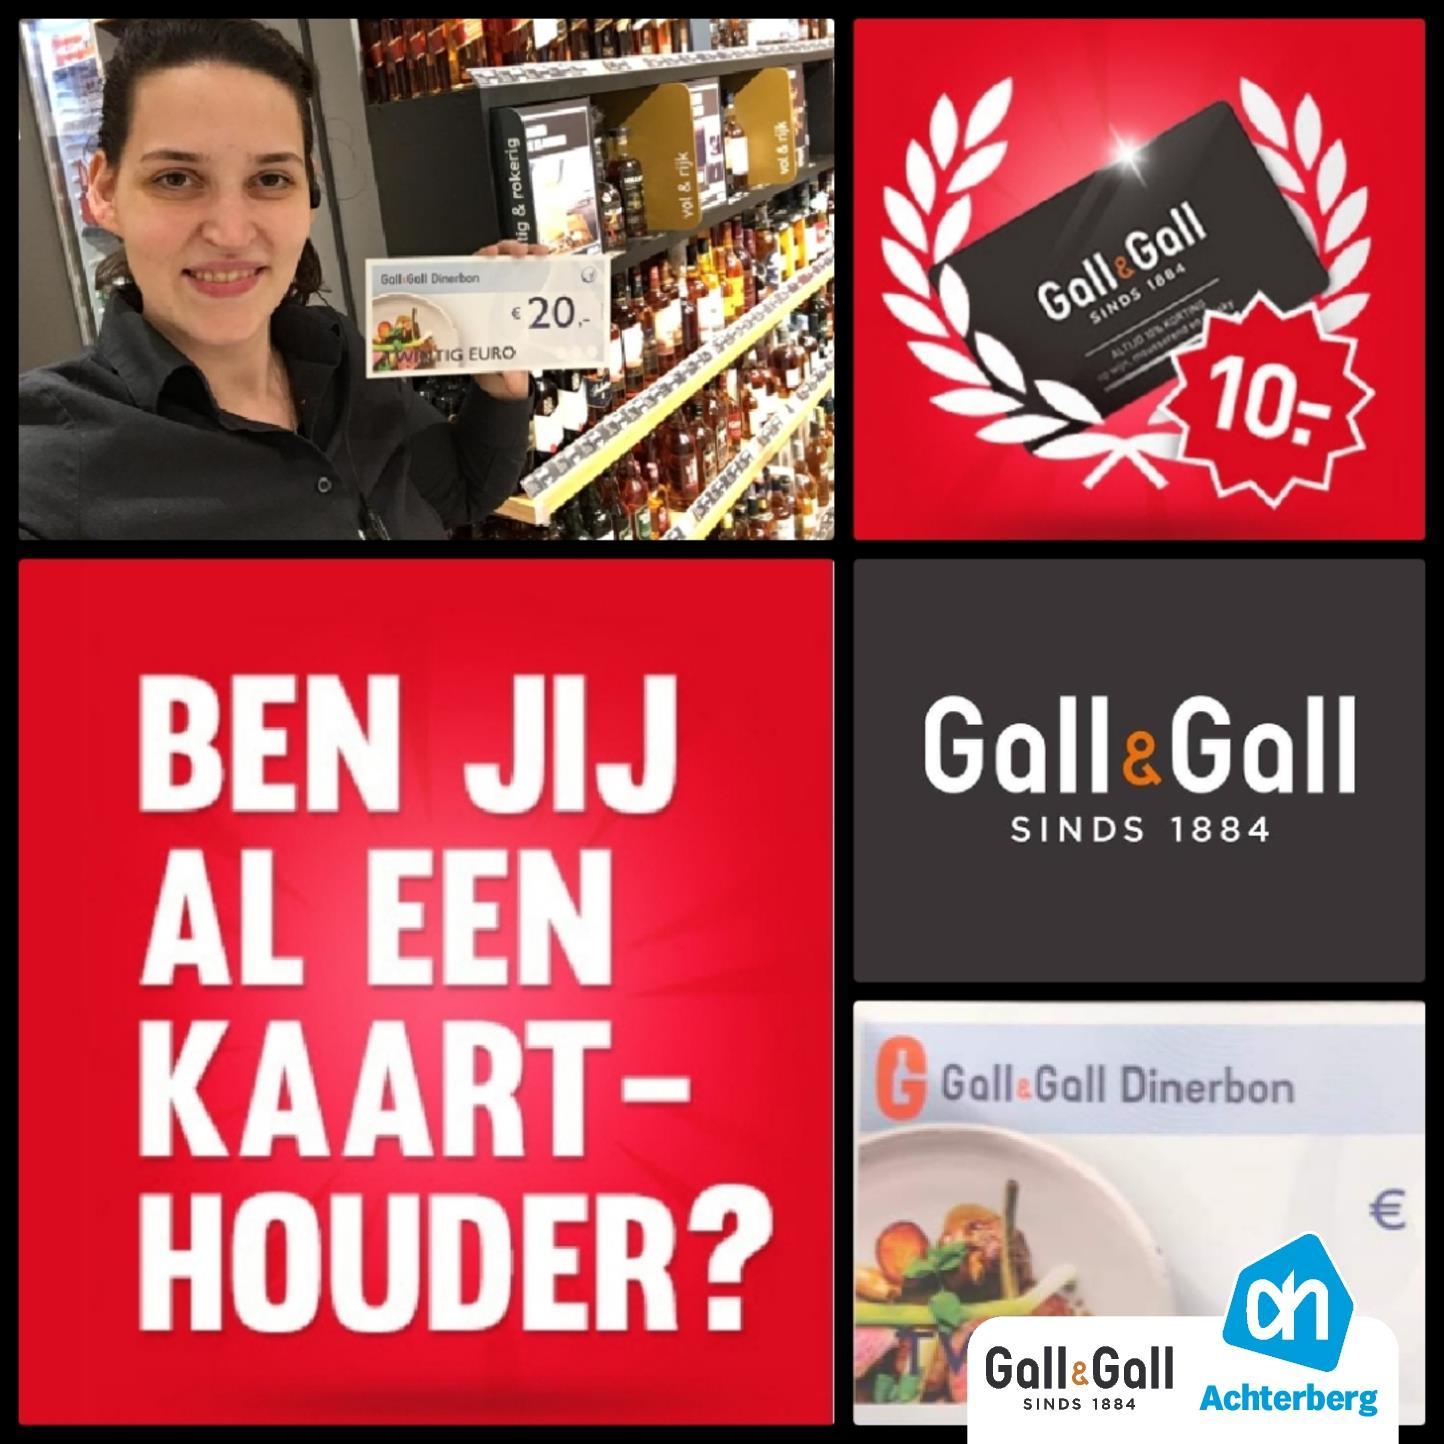 Ben jij al Gall&Gall kaarthouder?